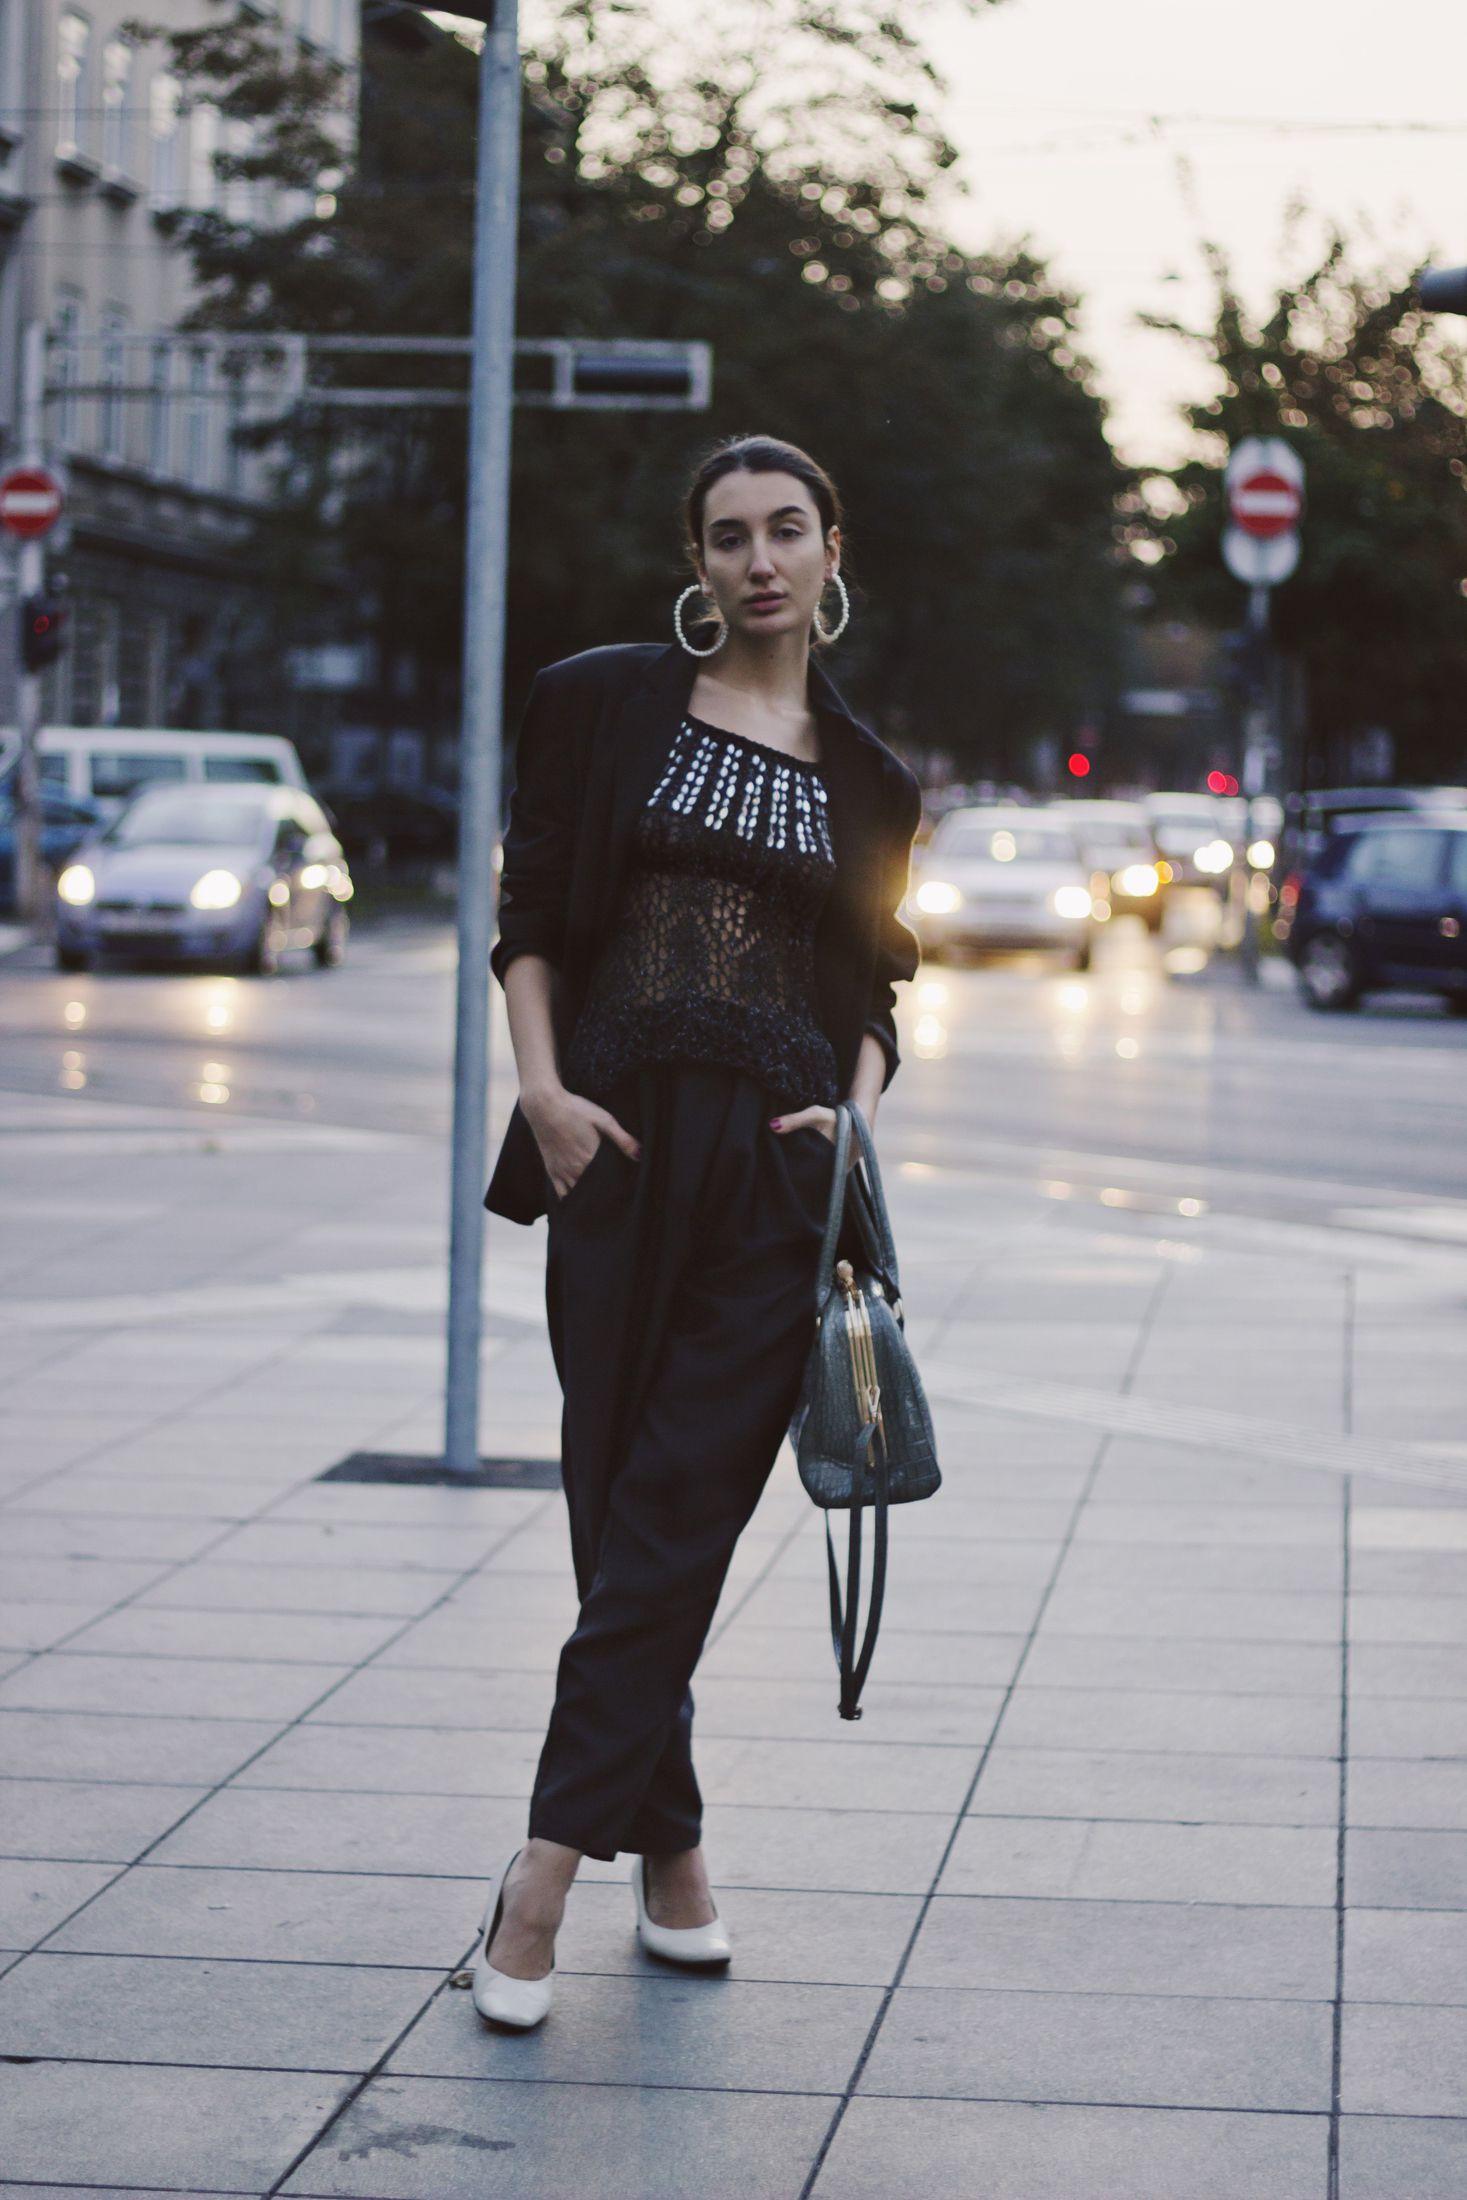 Pogledaj stil Miljane Krtinić Rončević